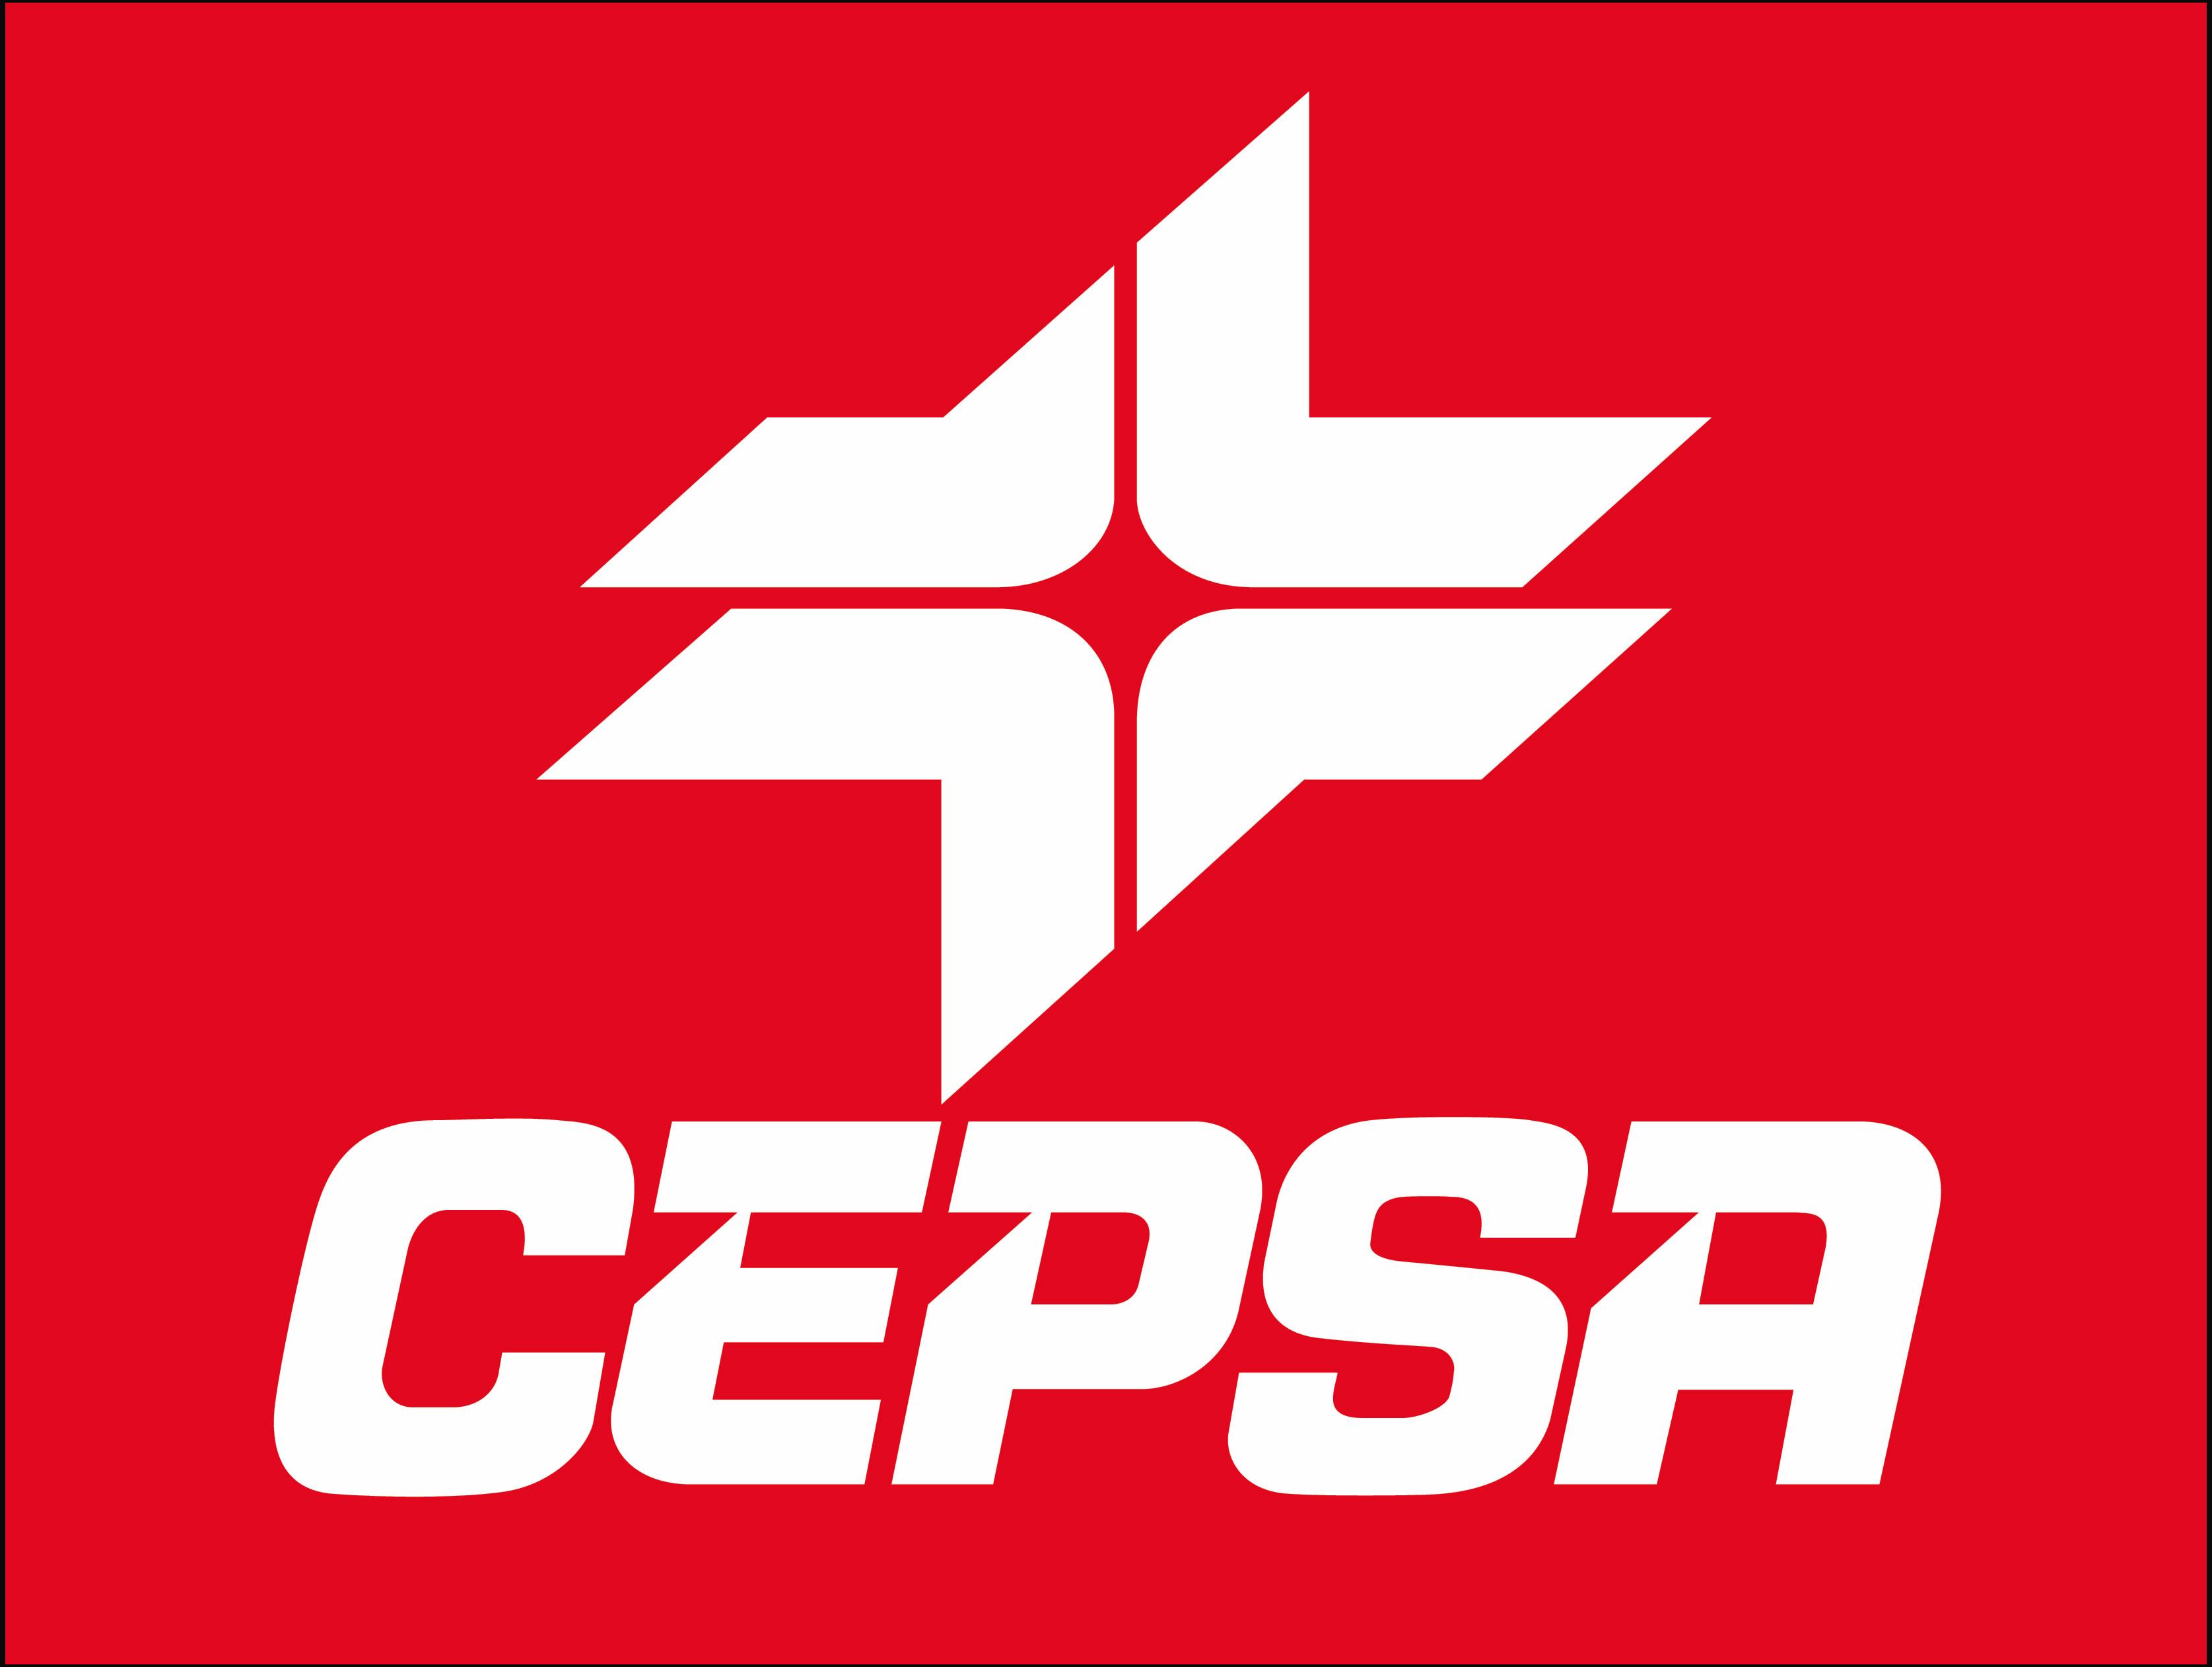 cepsa1-3553061